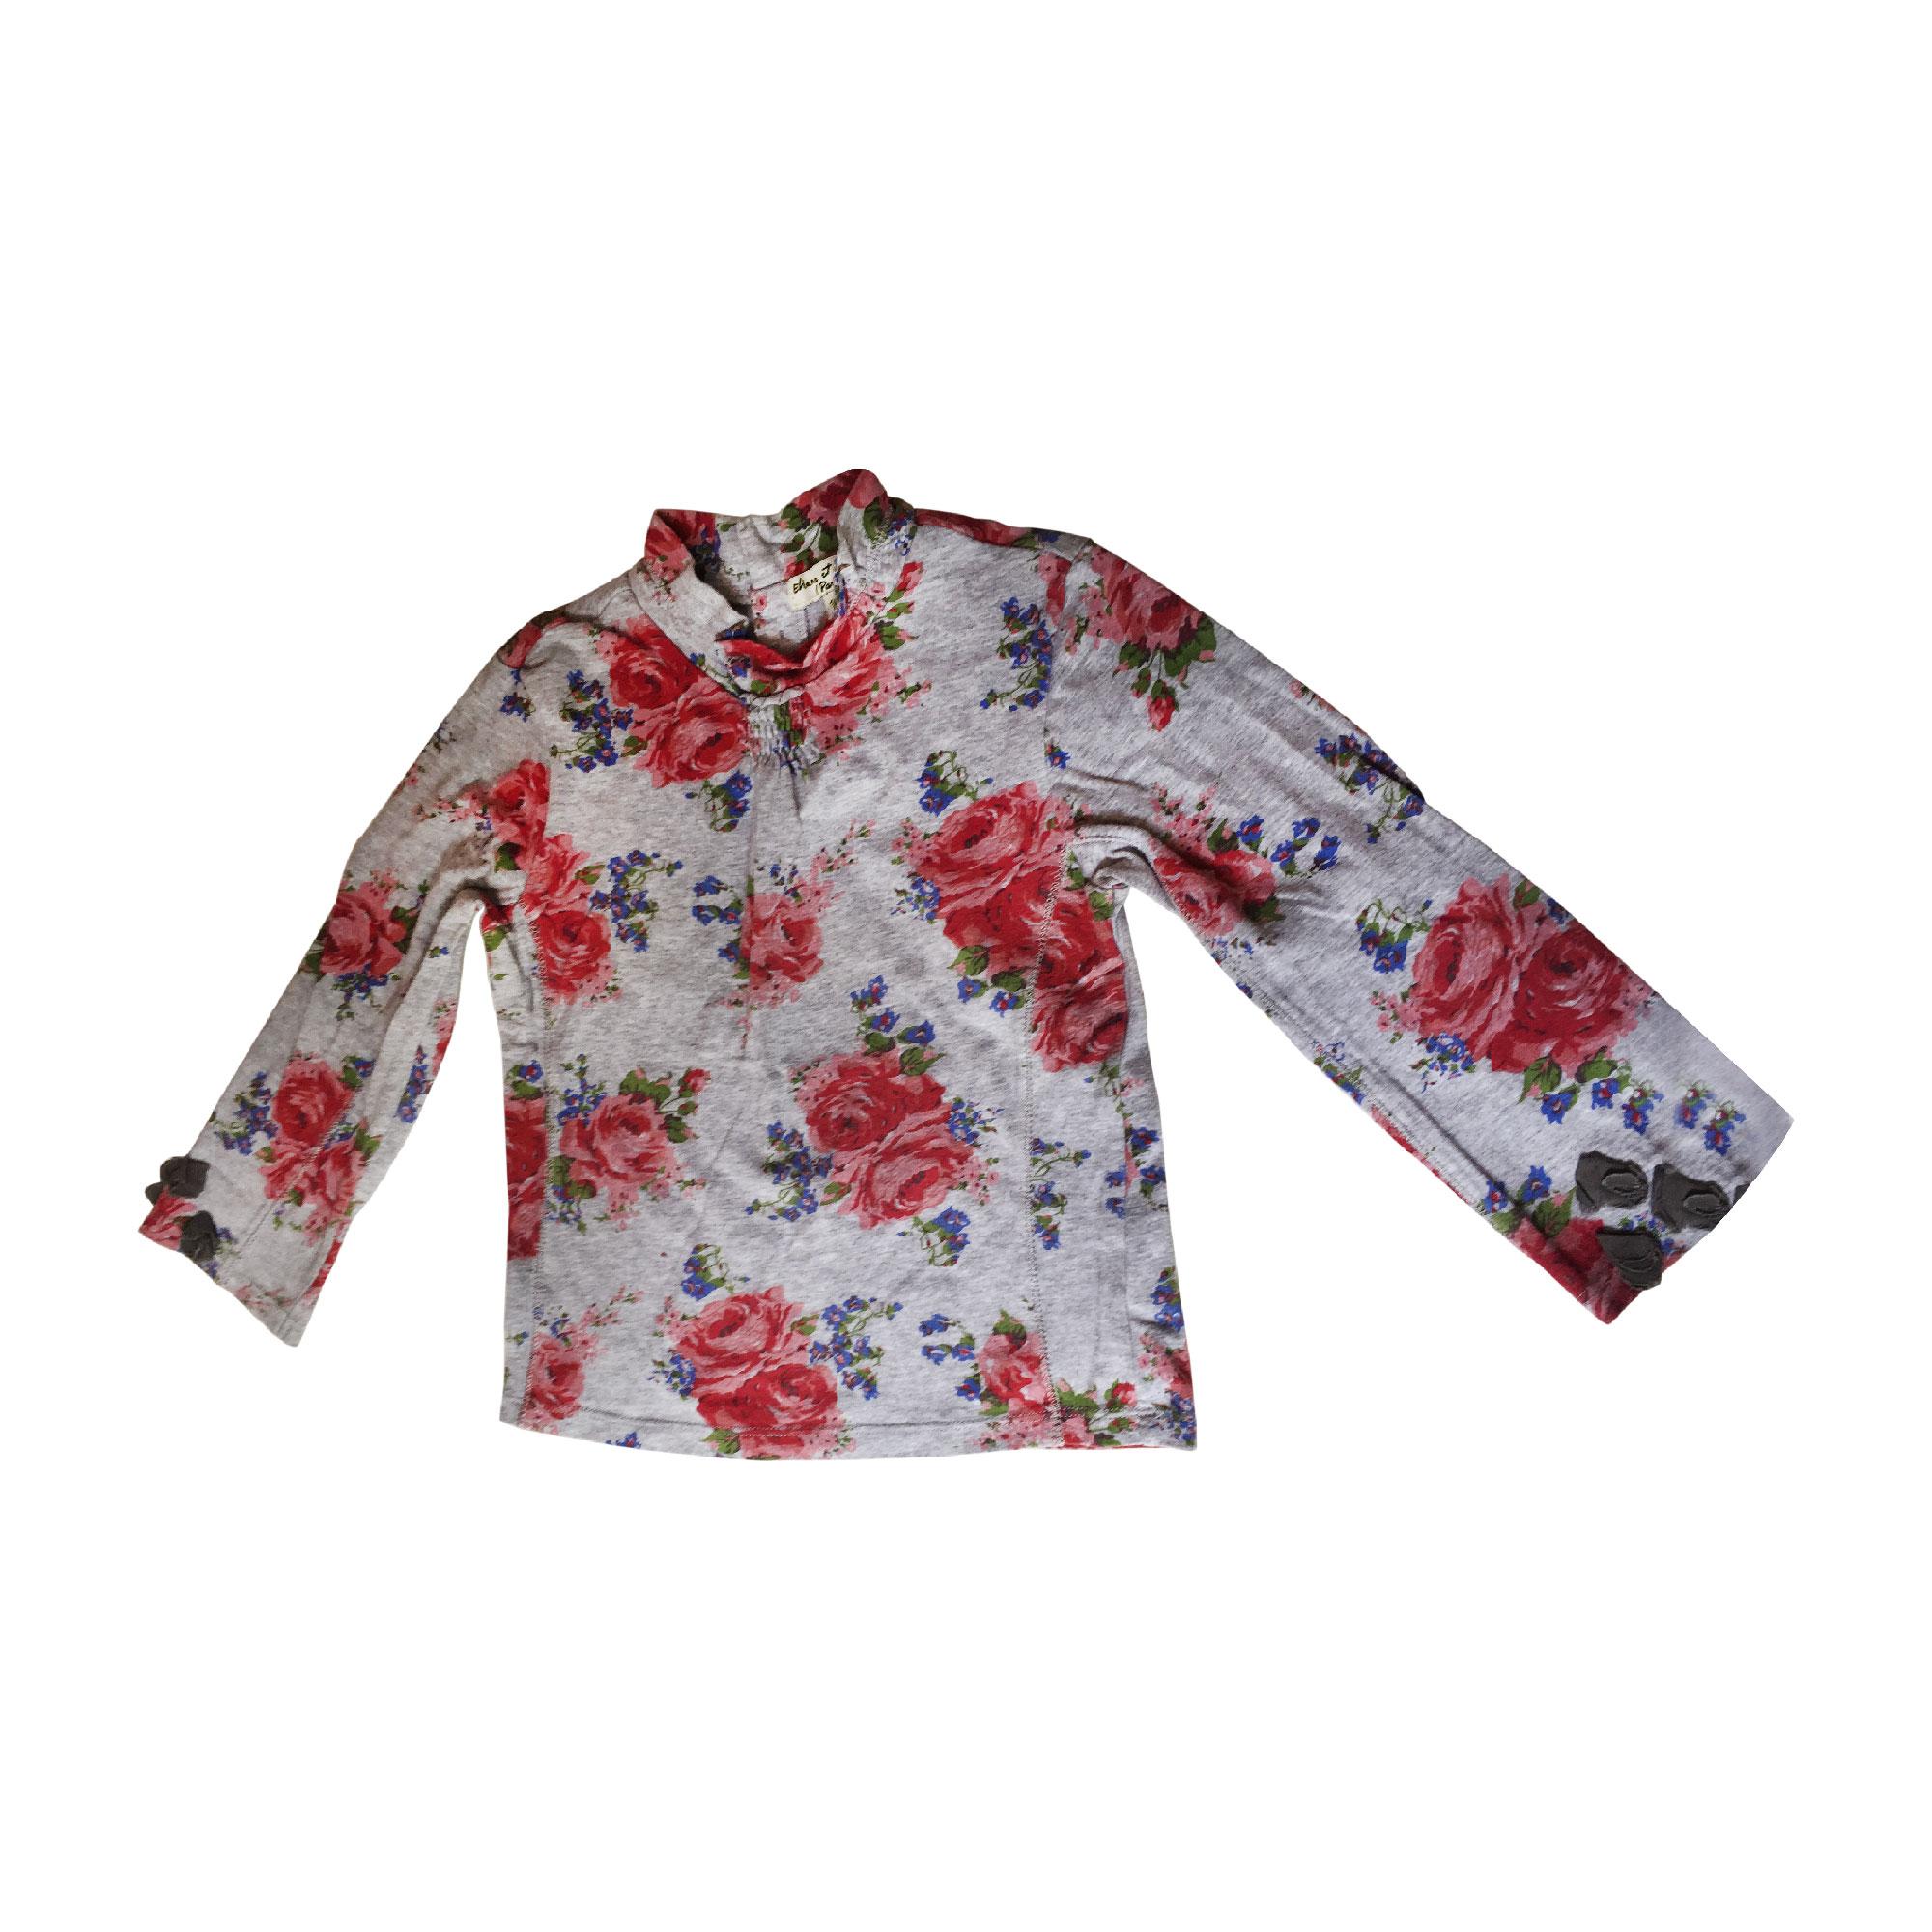 Top, Tee-shirt ELIANE ET LENA Gris, anthracite